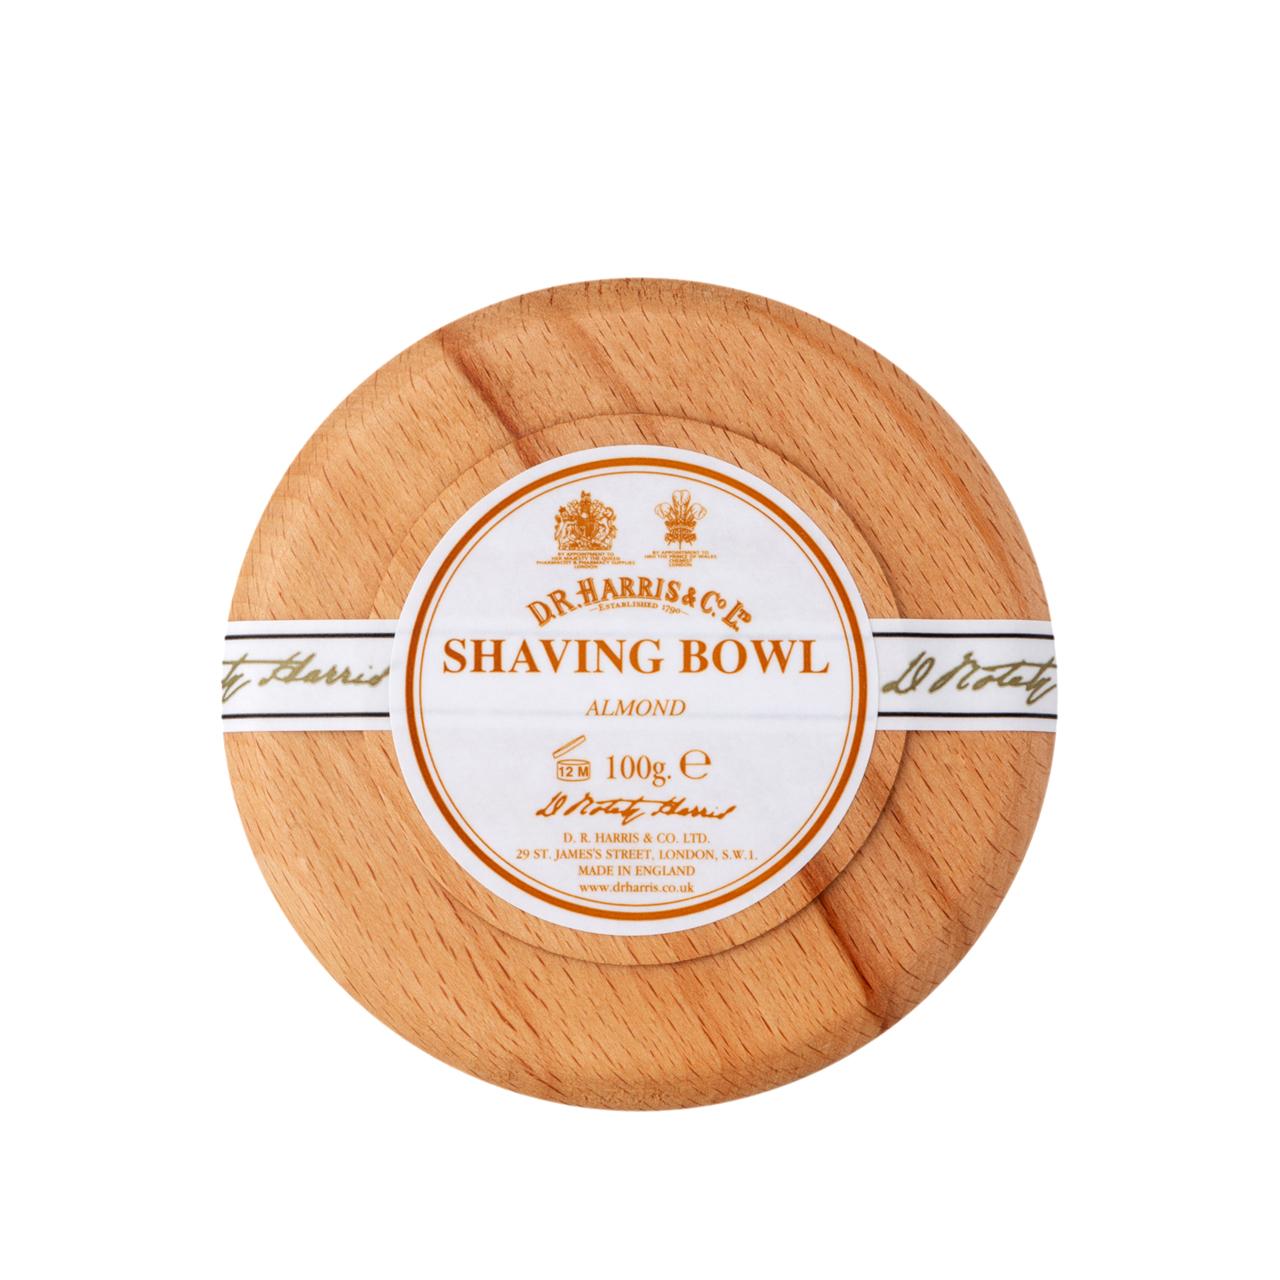 Almond - Shaving Soap Bowl